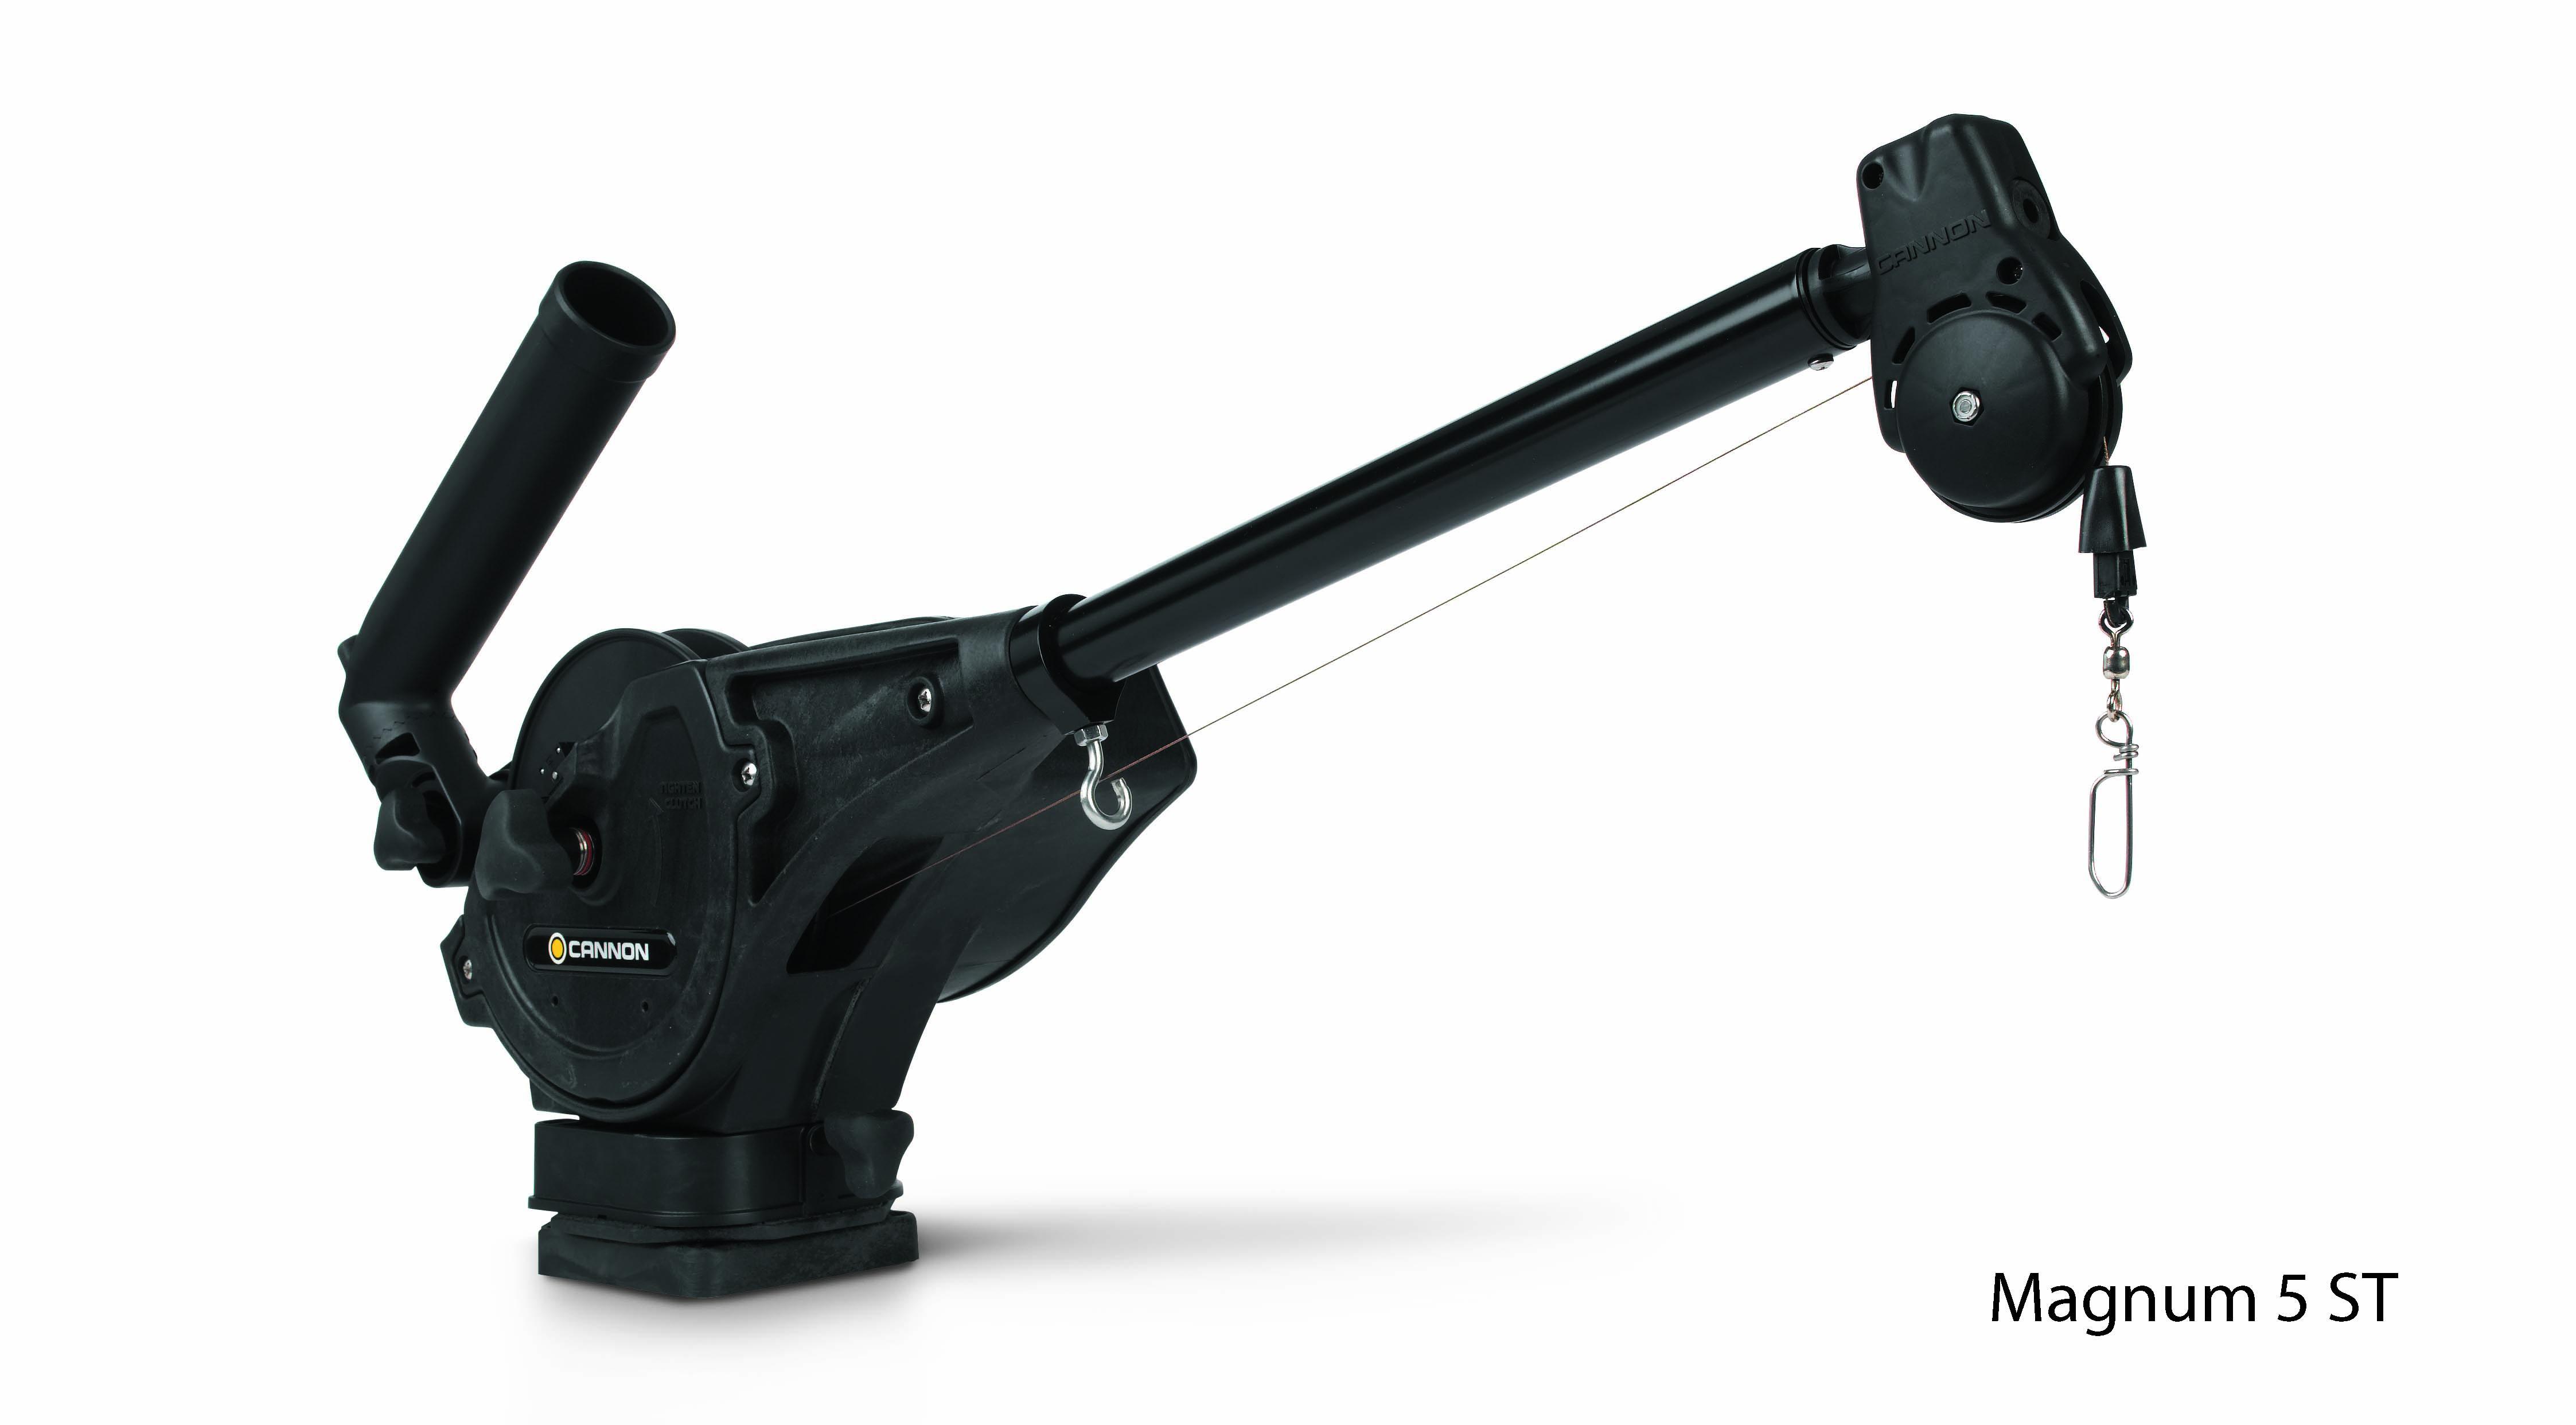 Cannon Downrigger Magnum 5 ST